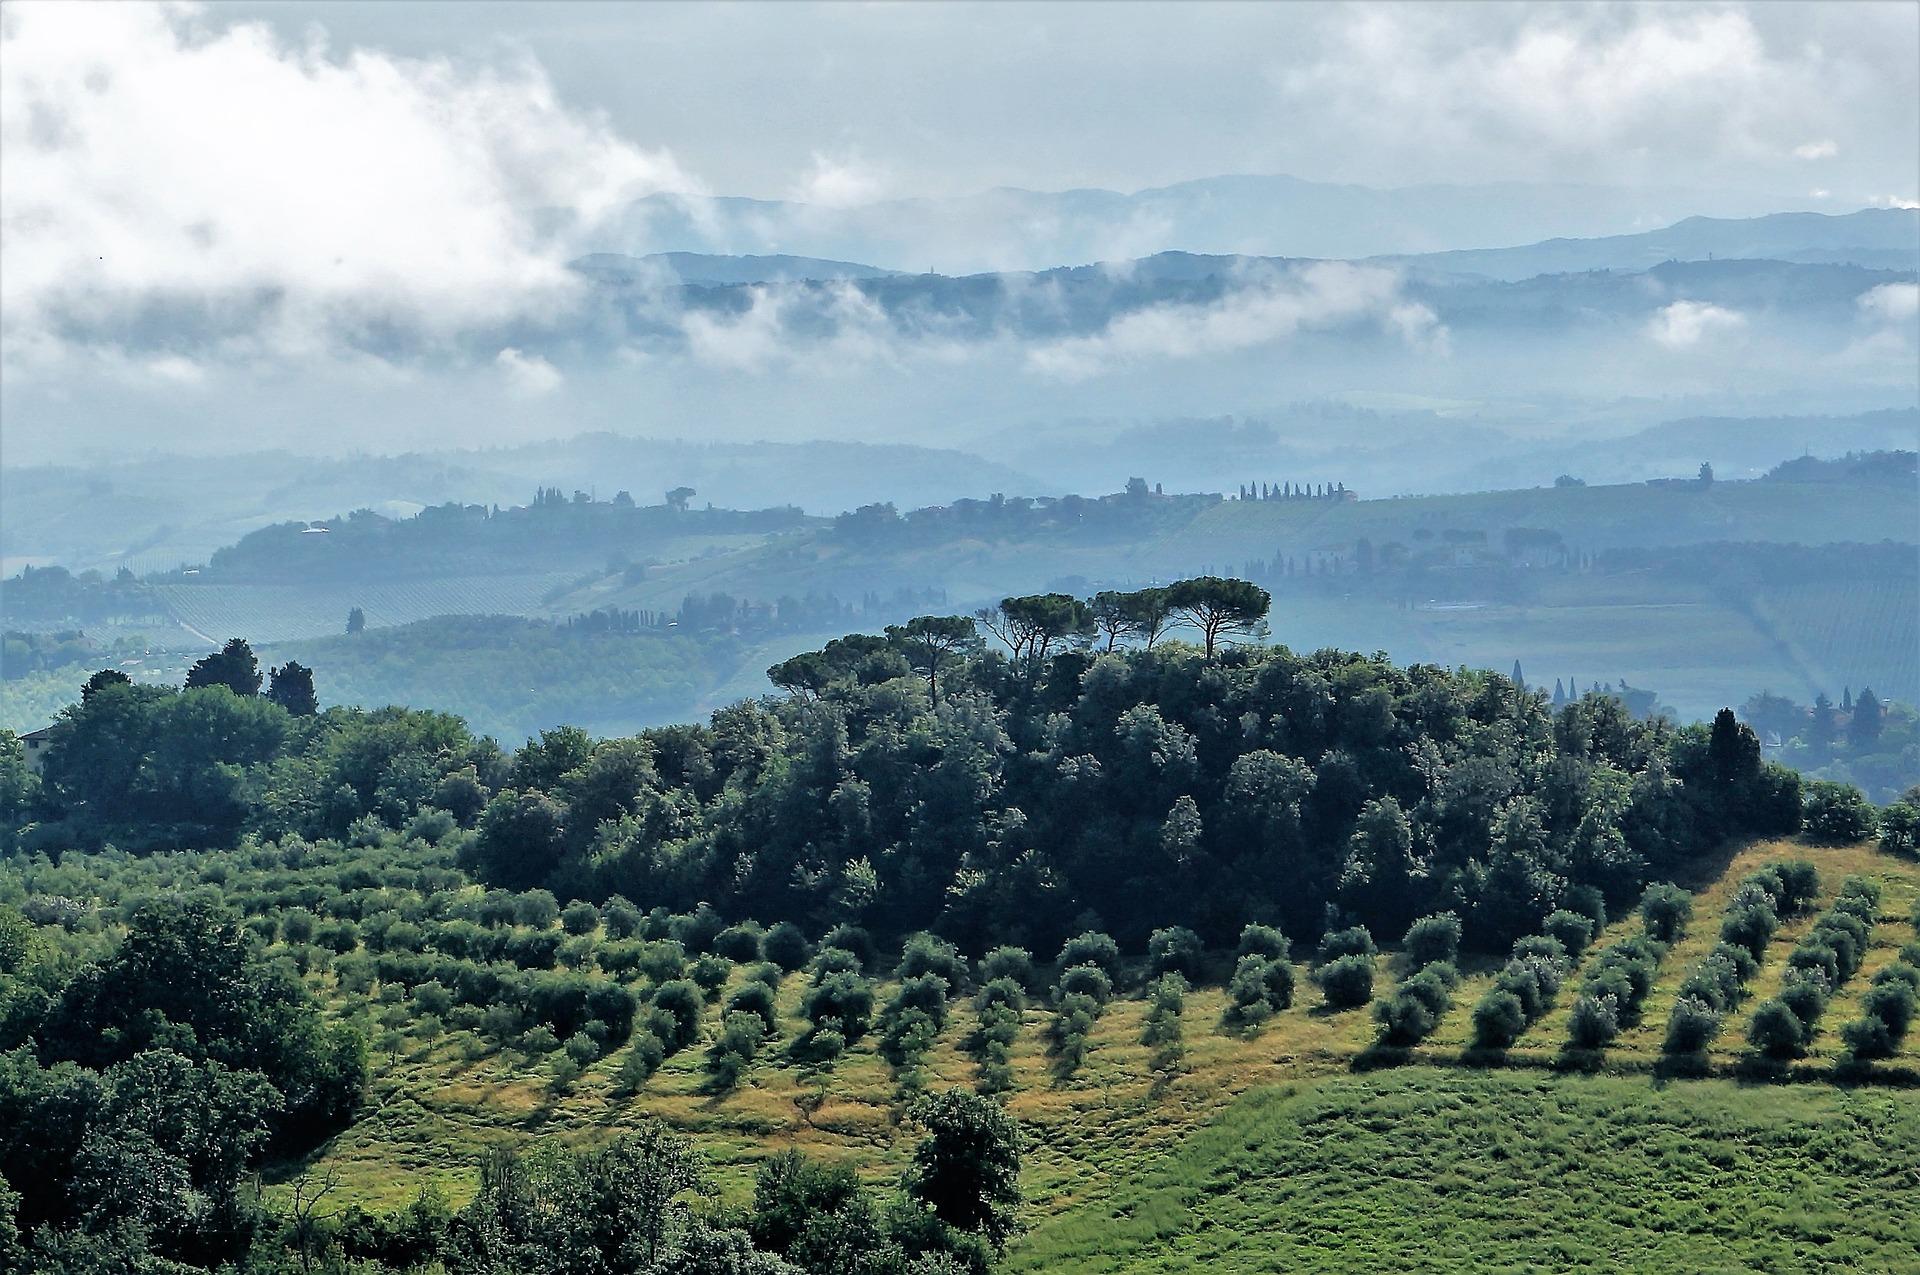 La Toscana, regina dell'Olio Extravergine di Oliva